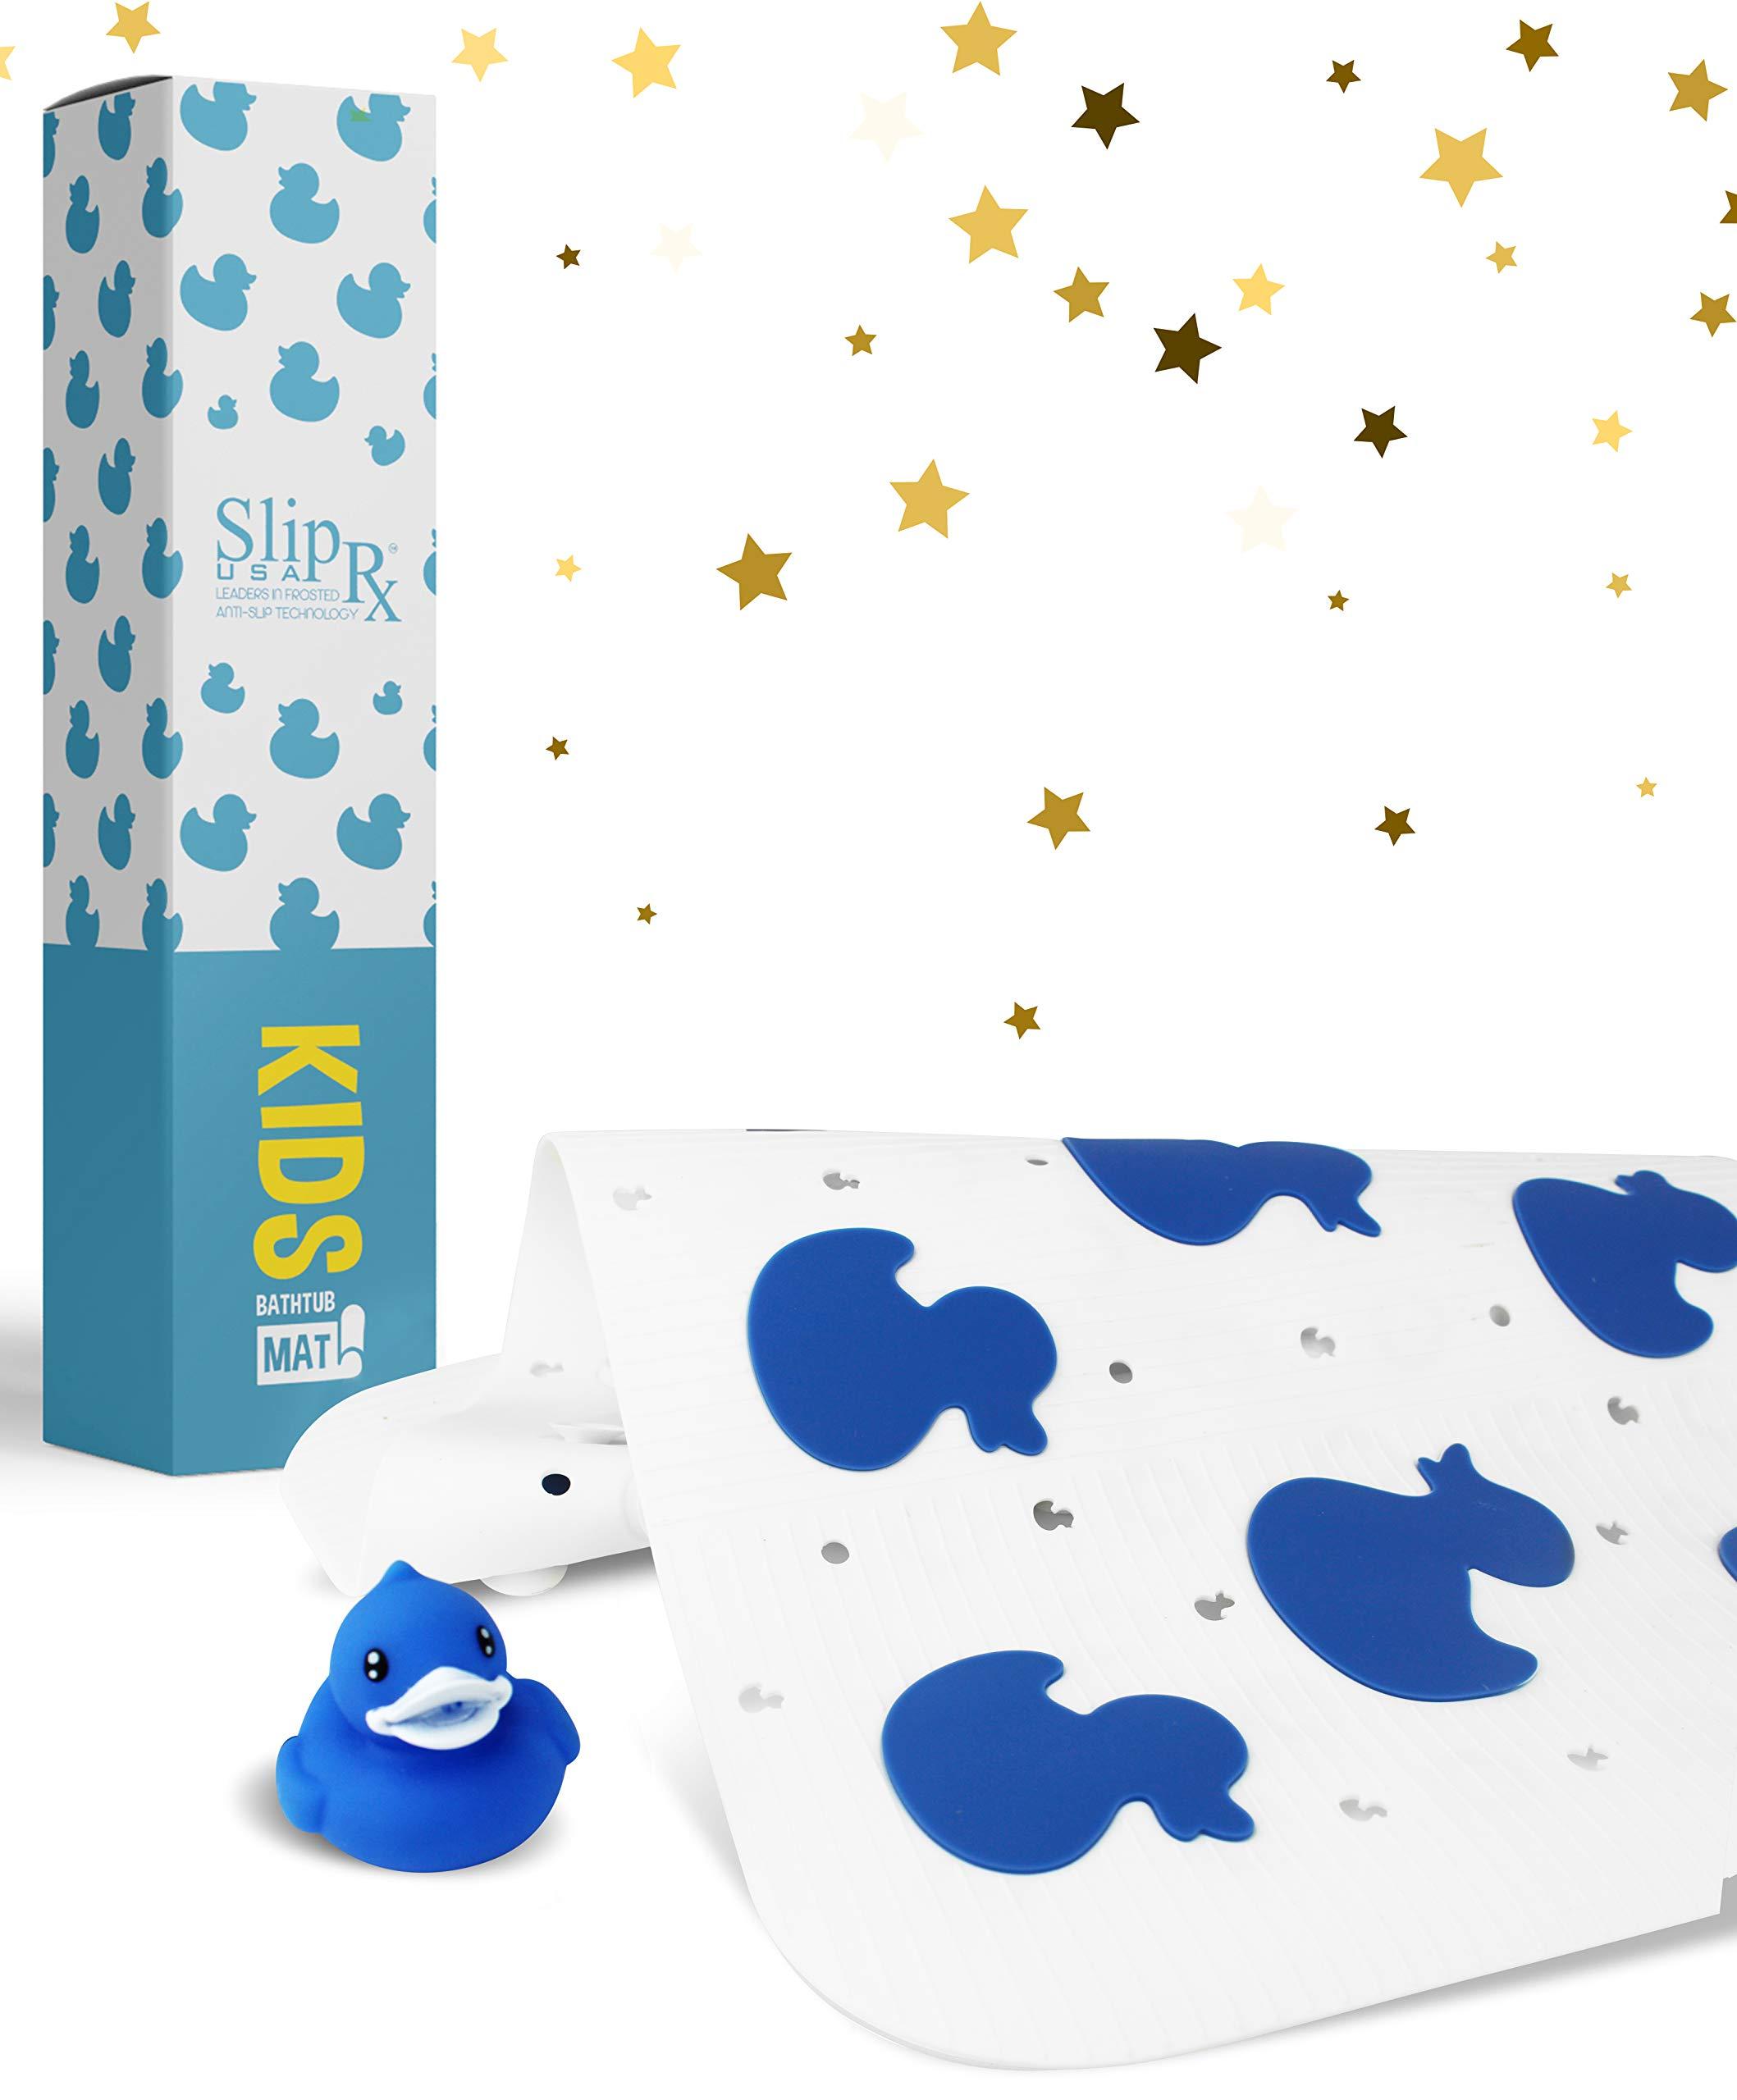 Kids Non-Slip Bathtub Mat | Non-Toxic Shower Grip, Machine Washable, Antibacterial, BPA, Latex, Phthalate Free | Mold & Mildew Resistant, Anti-Slip Bath Tub Baby Bathroom Mats (Duck) (Blue Ducks)